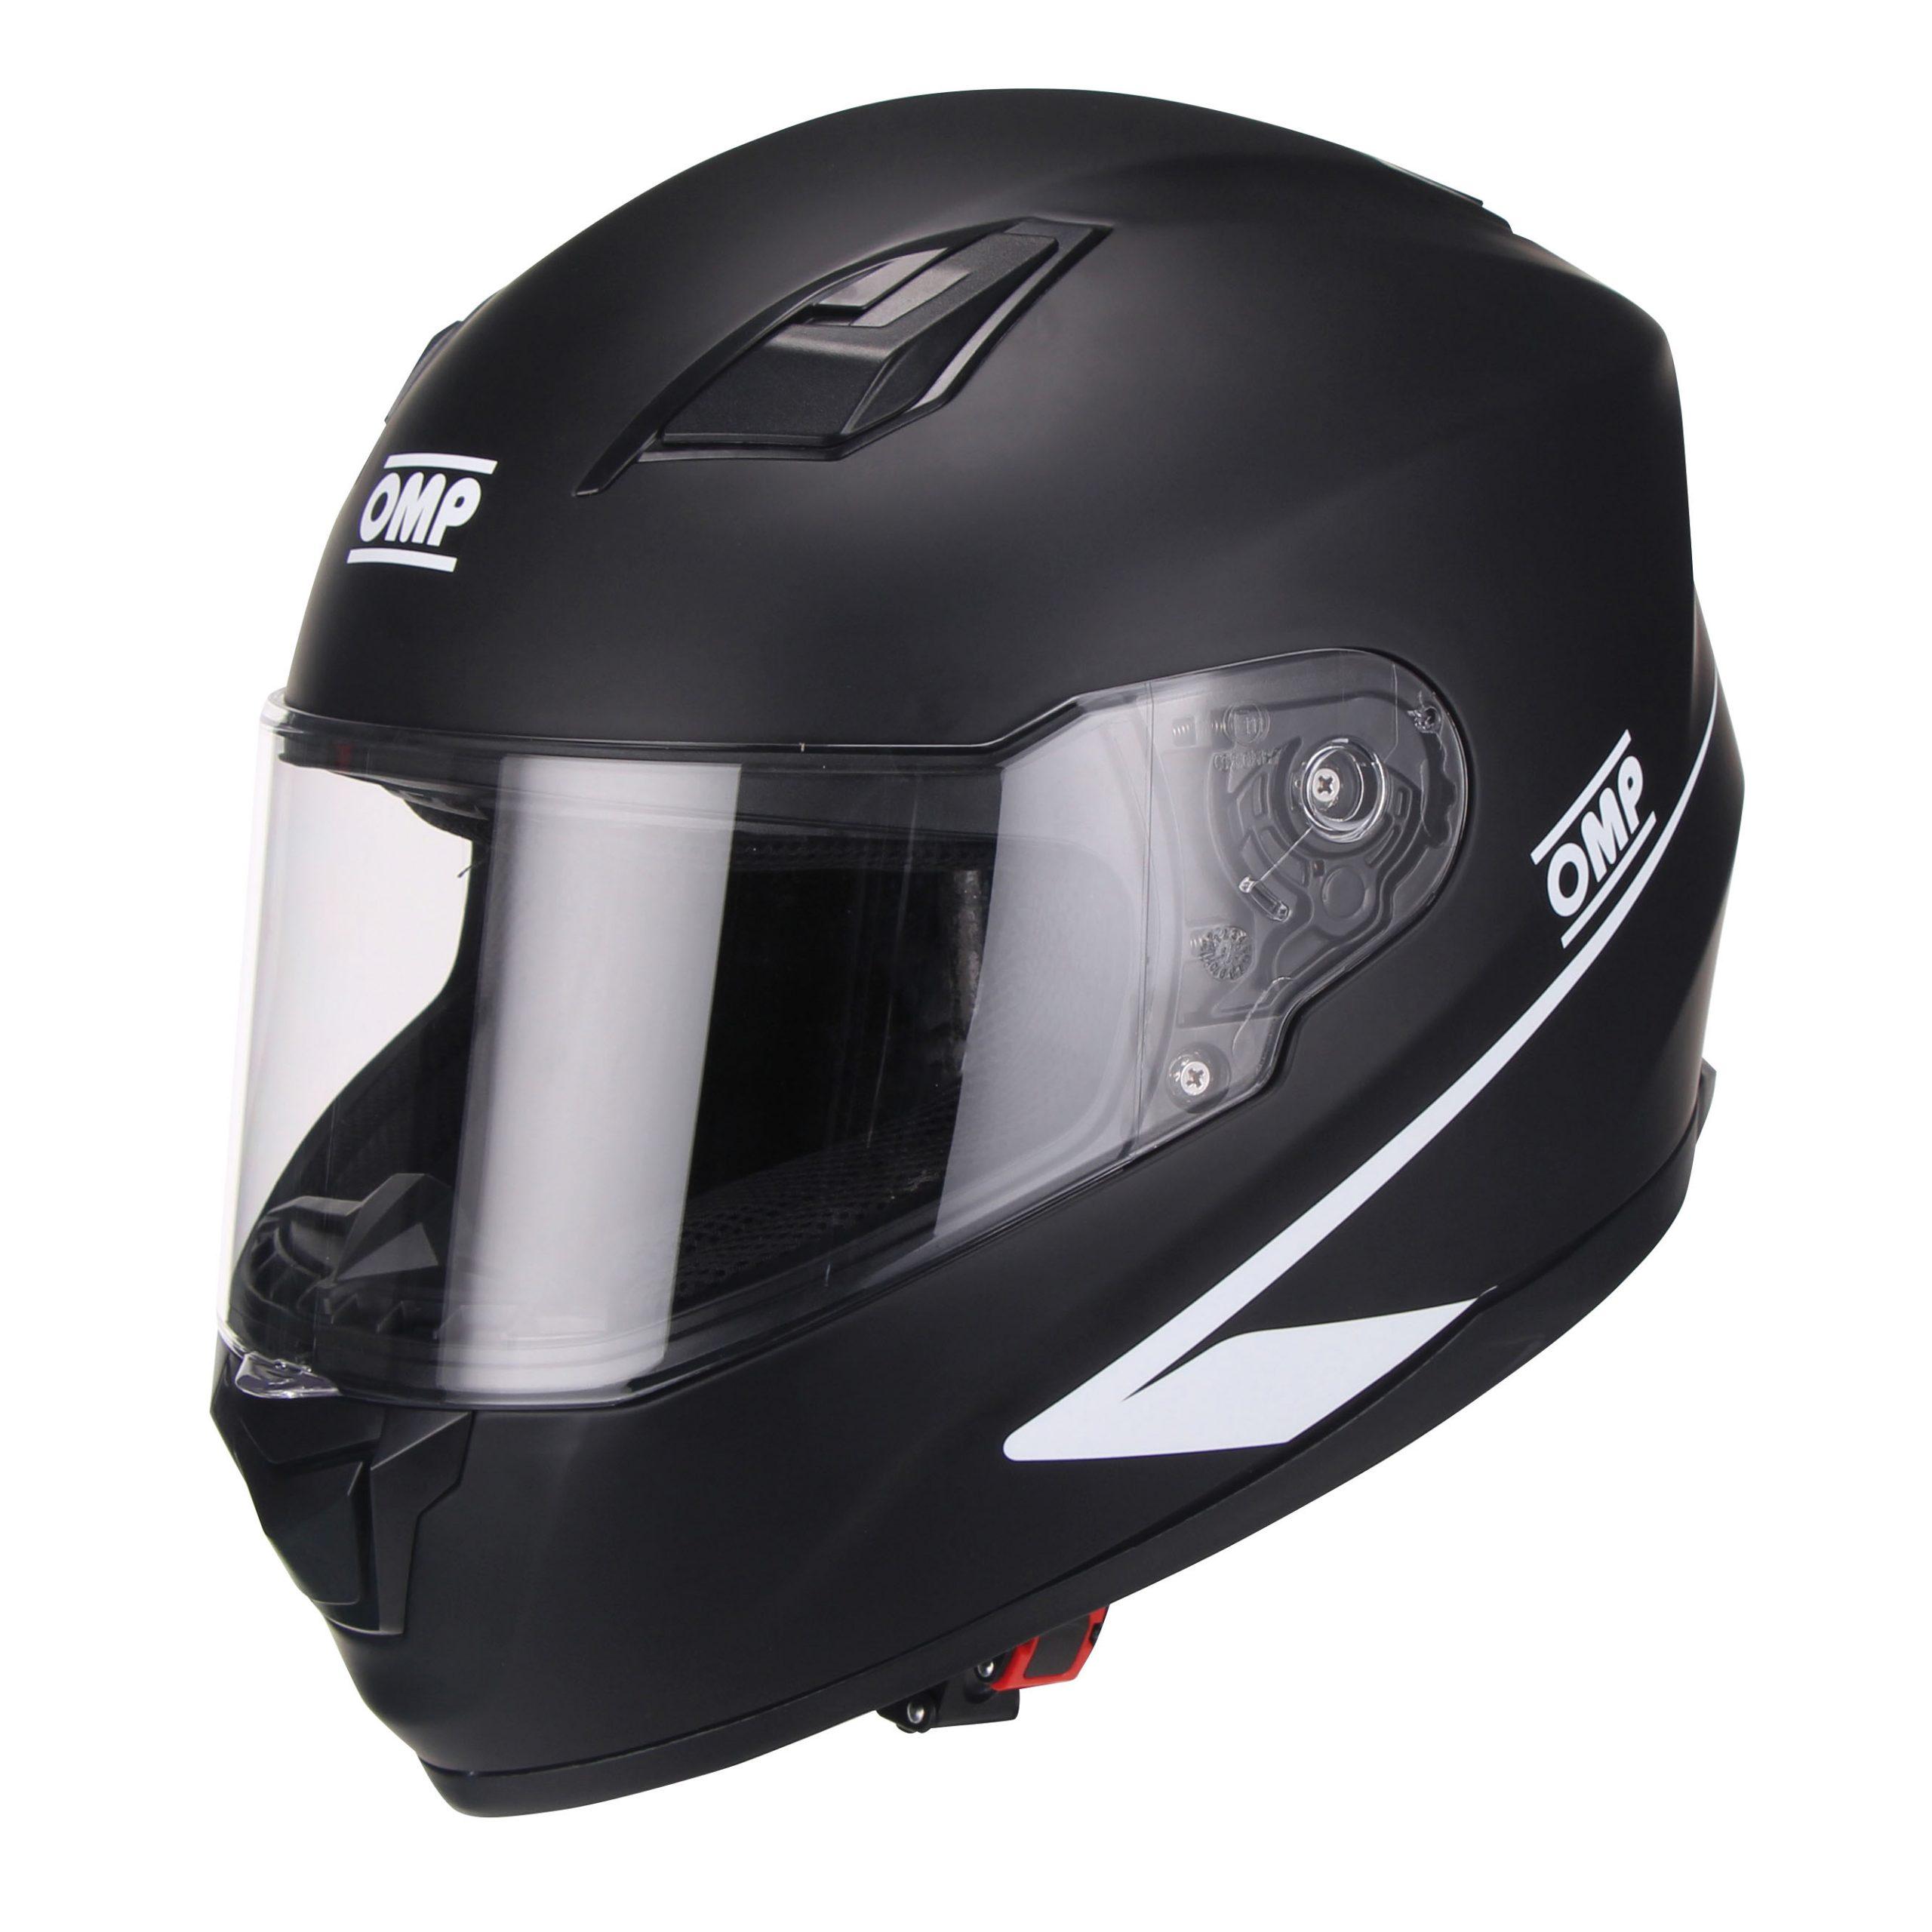 SC613 OMP Circuit Evo Karting Helmet